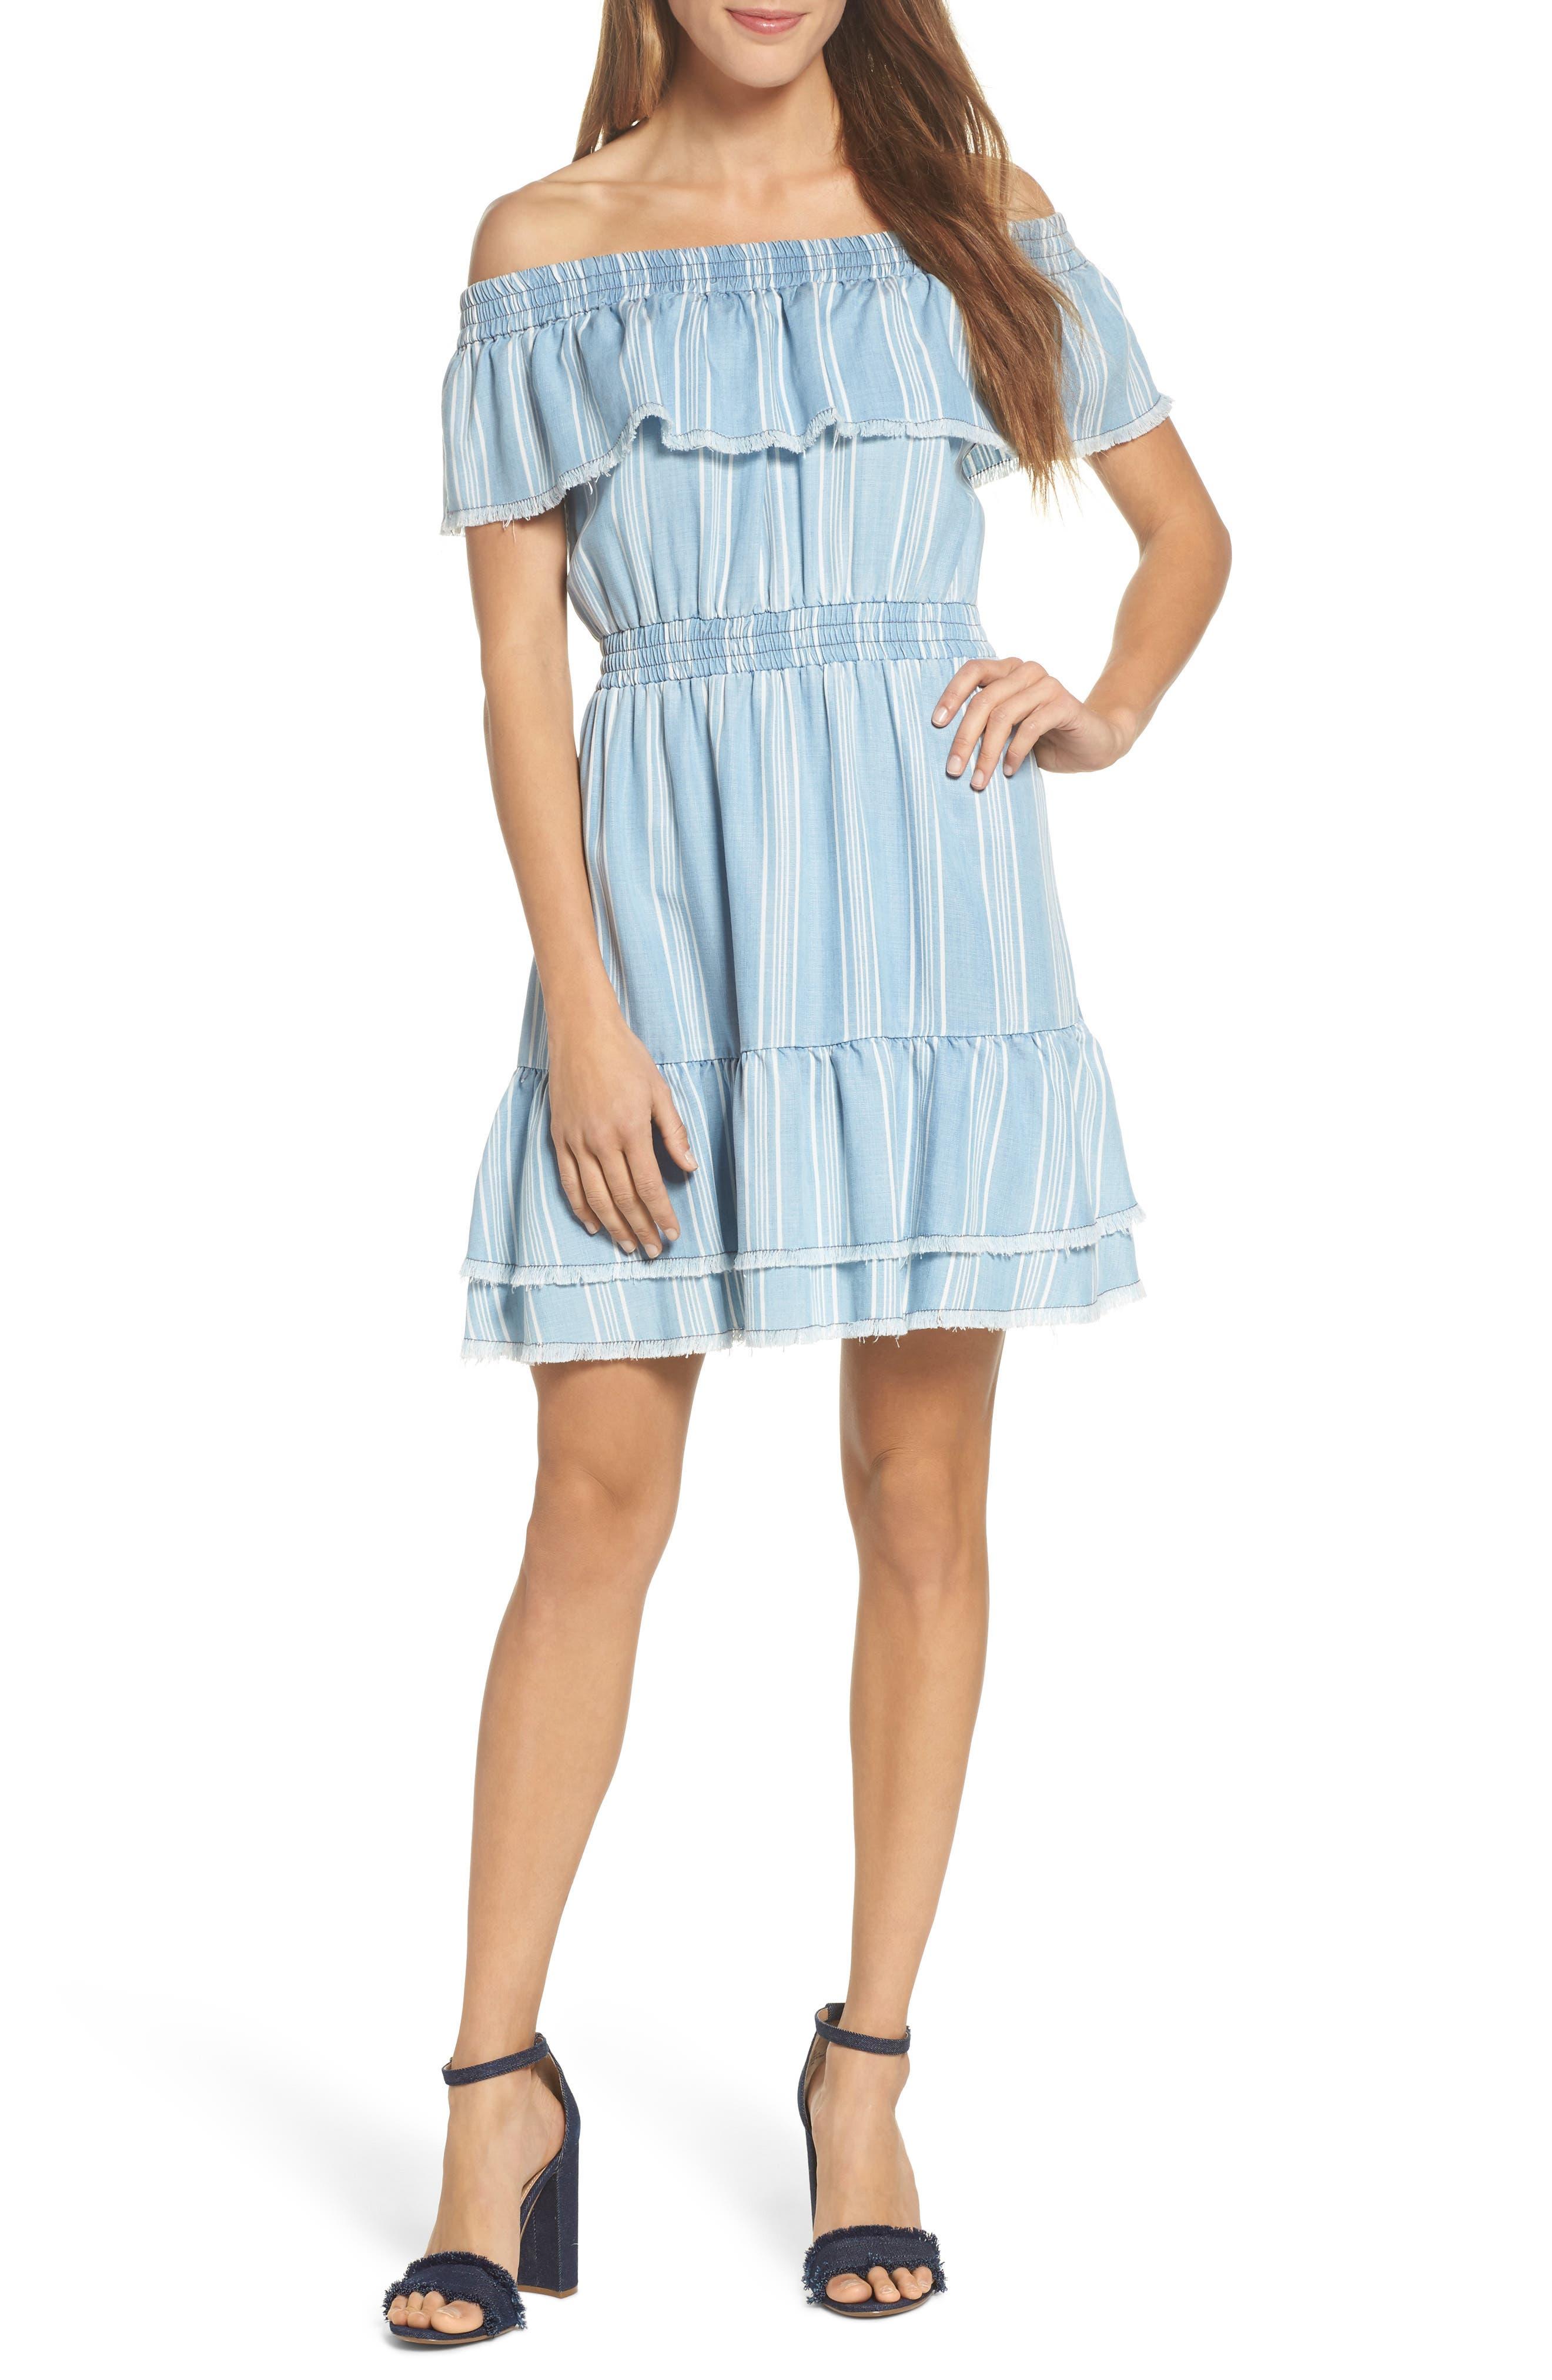 Bb Dakota Coco Stripe Off The Shoulder Ruffle Dress, Blue